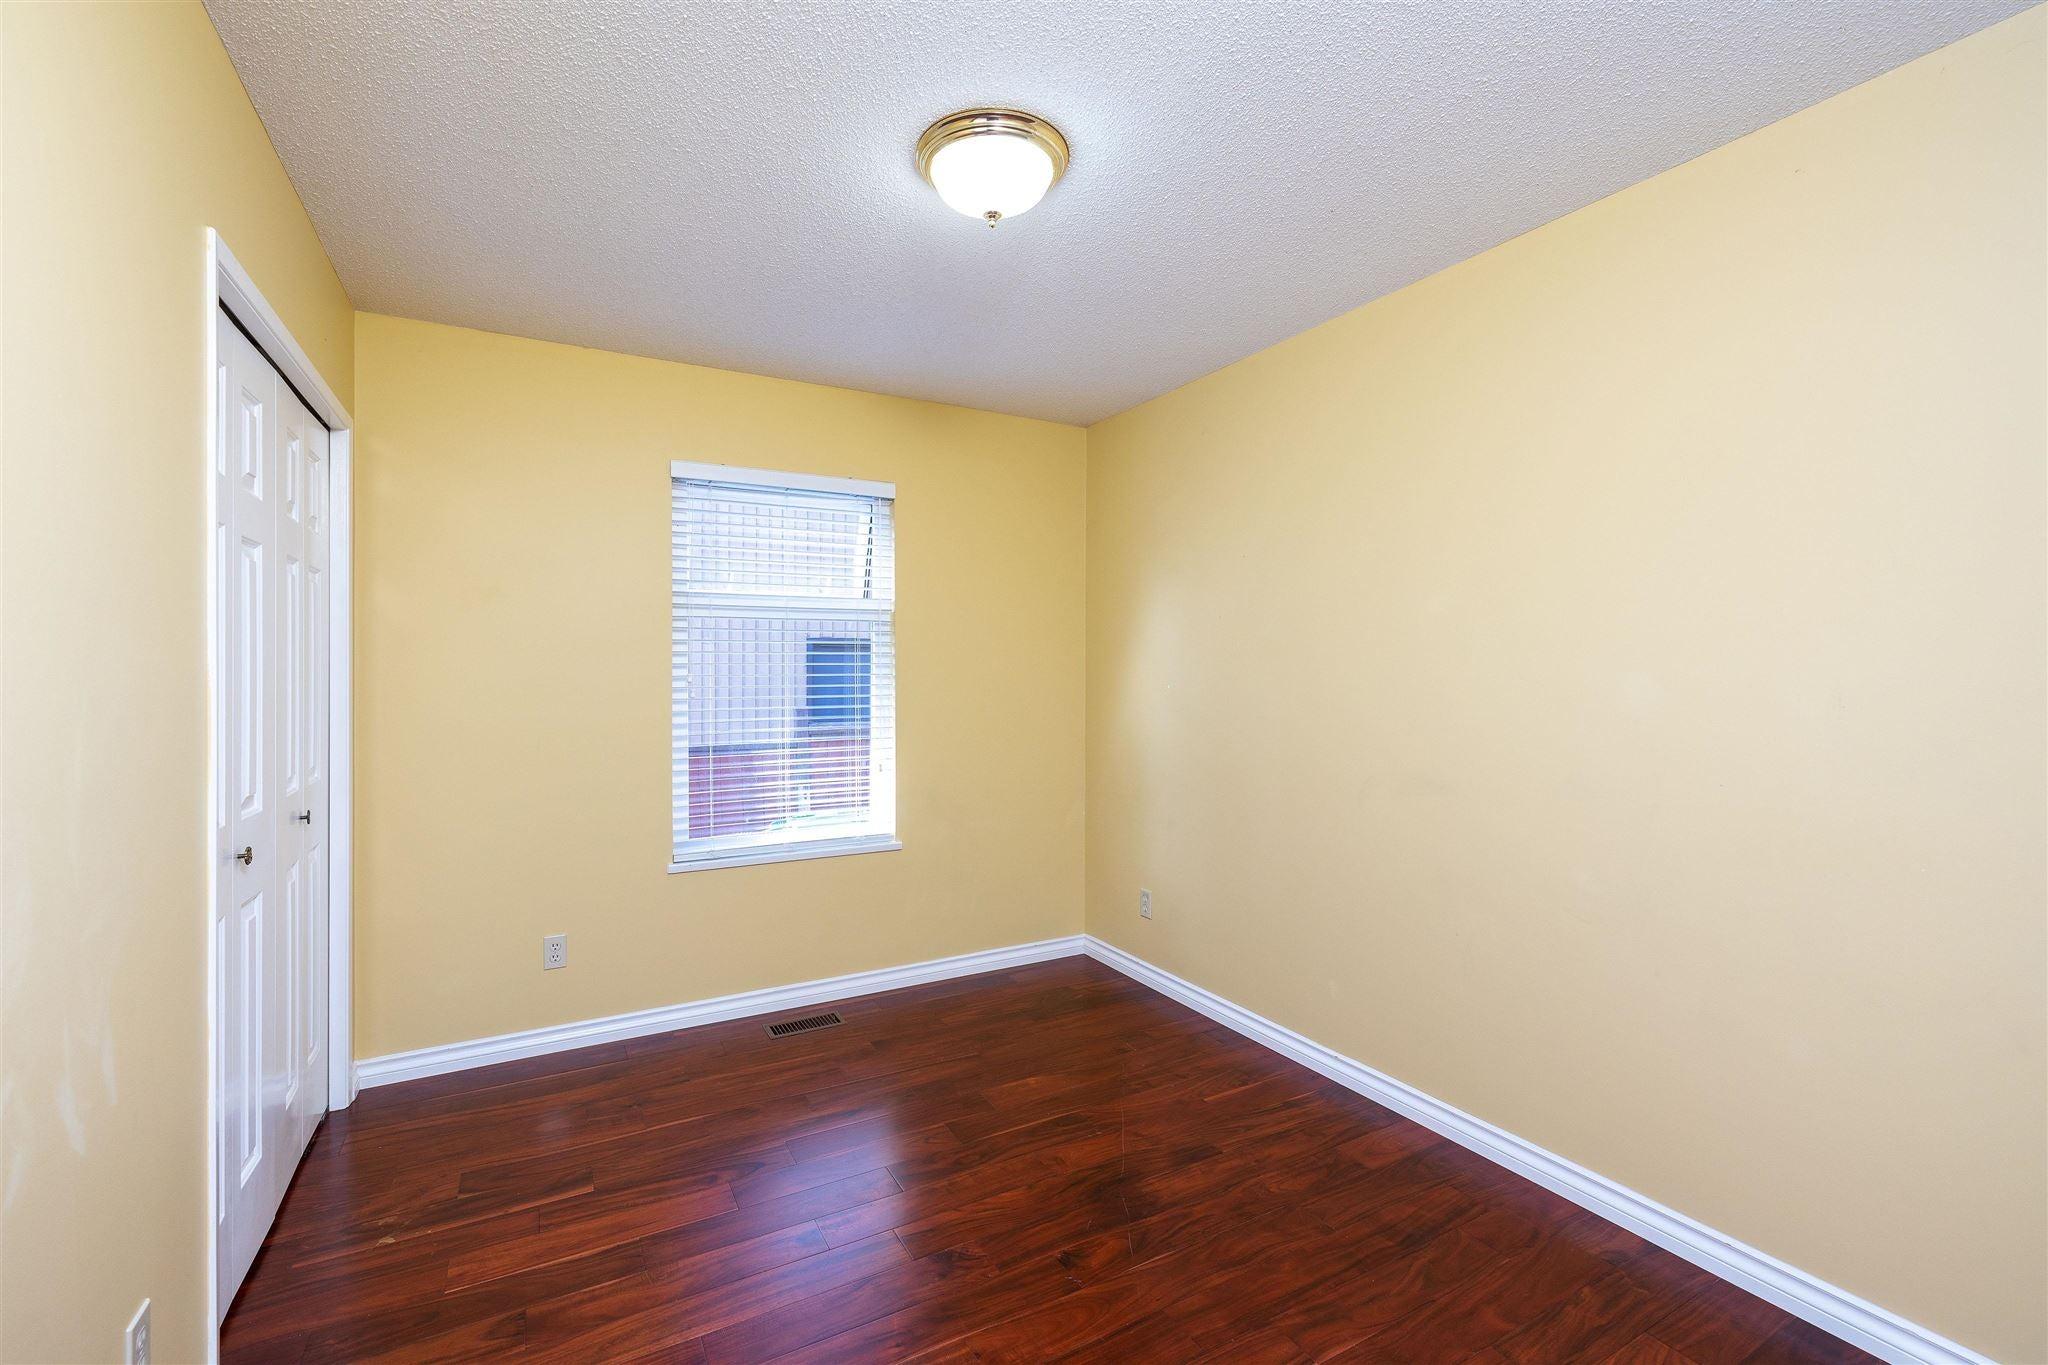 1743 148A STREET - Sunnyside Park Surrey House/Single Family for sale, 3 Bedrooms (R2604804) - #18